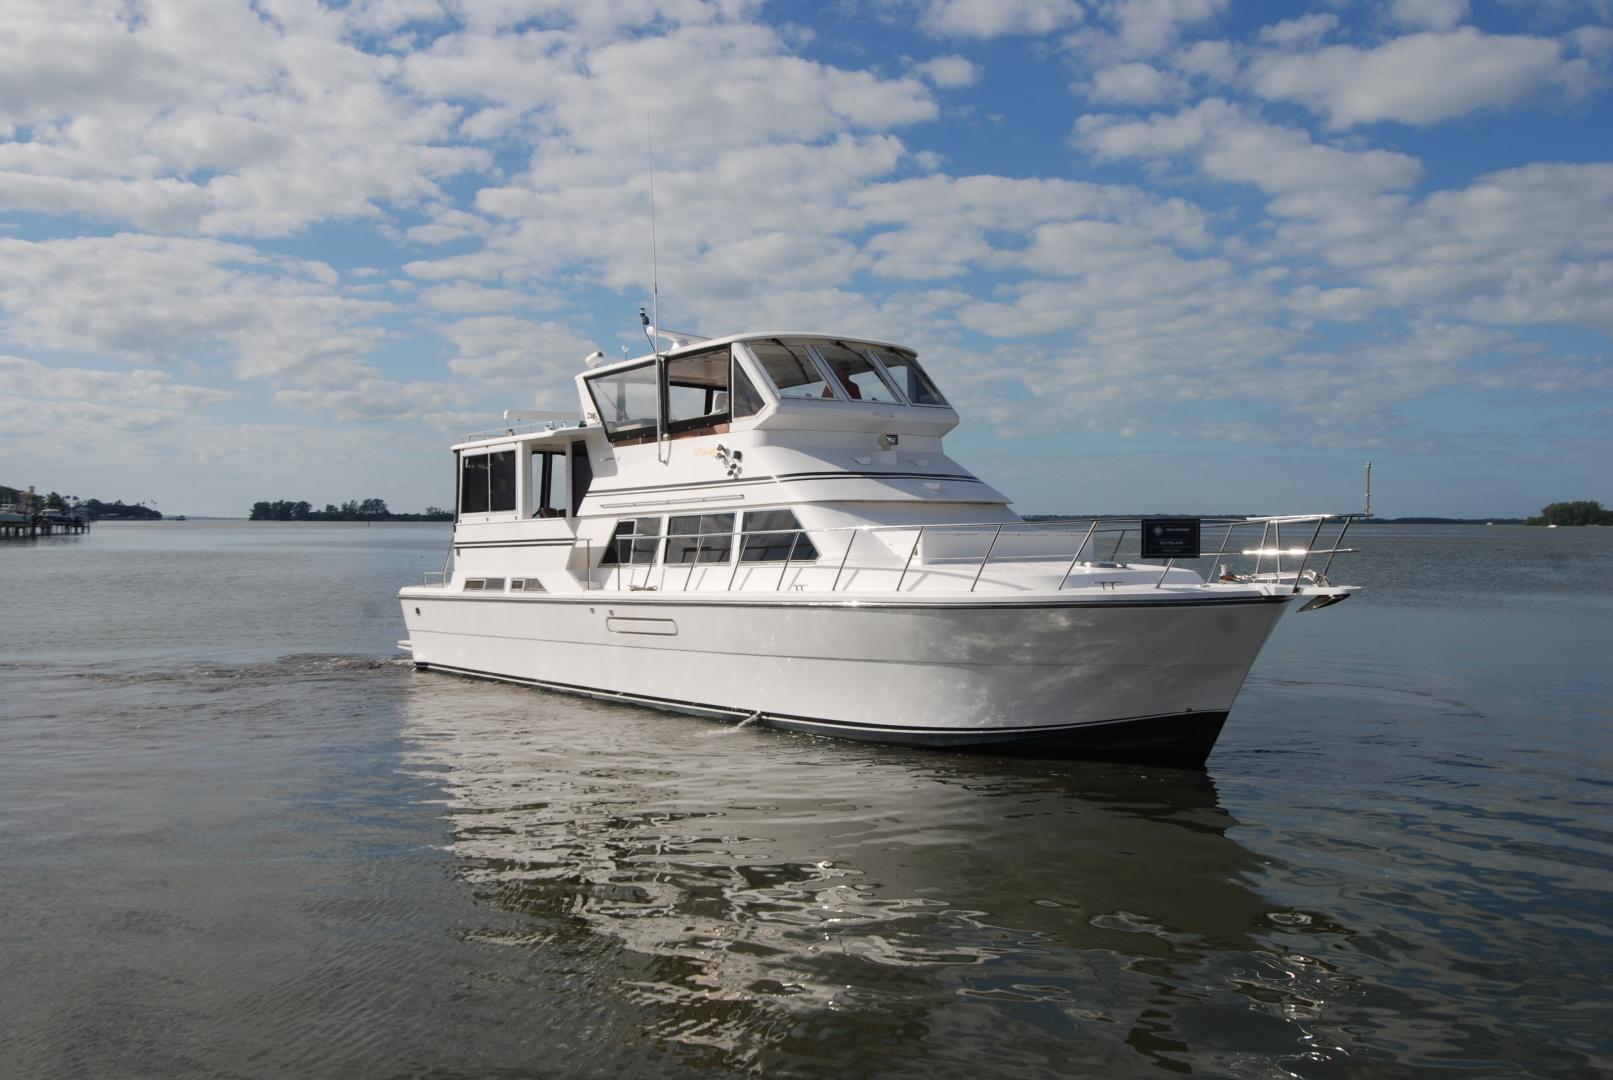 Novatec-Cockpit Motoryacht 2003-Liberty Dunedin-Florida-United States-1551404 | Thumbnail